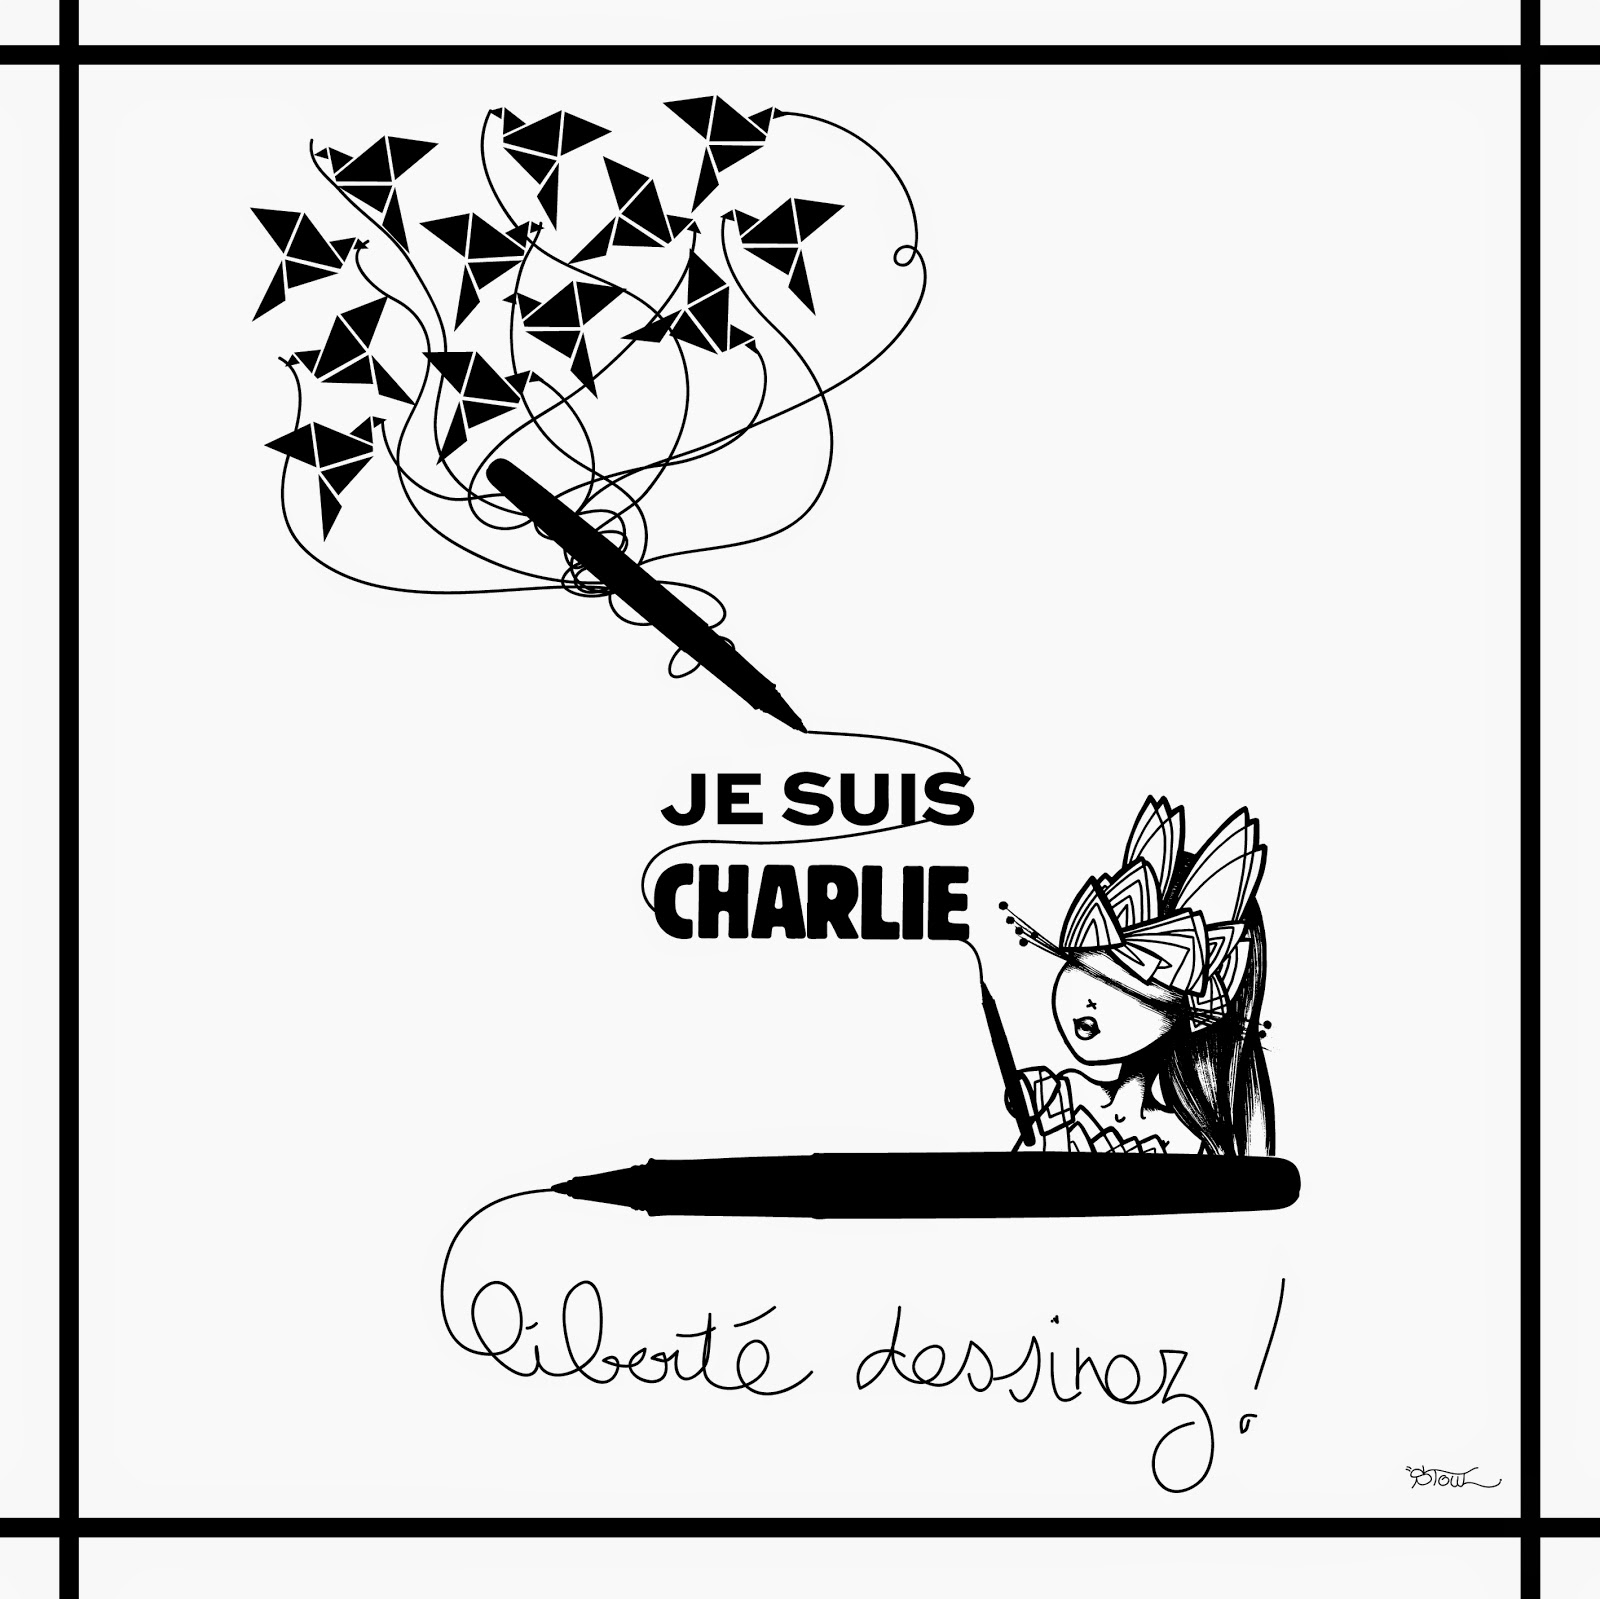 http://www.stoul.com/2015/01/jesuischarlie-liberte-dessinez.html